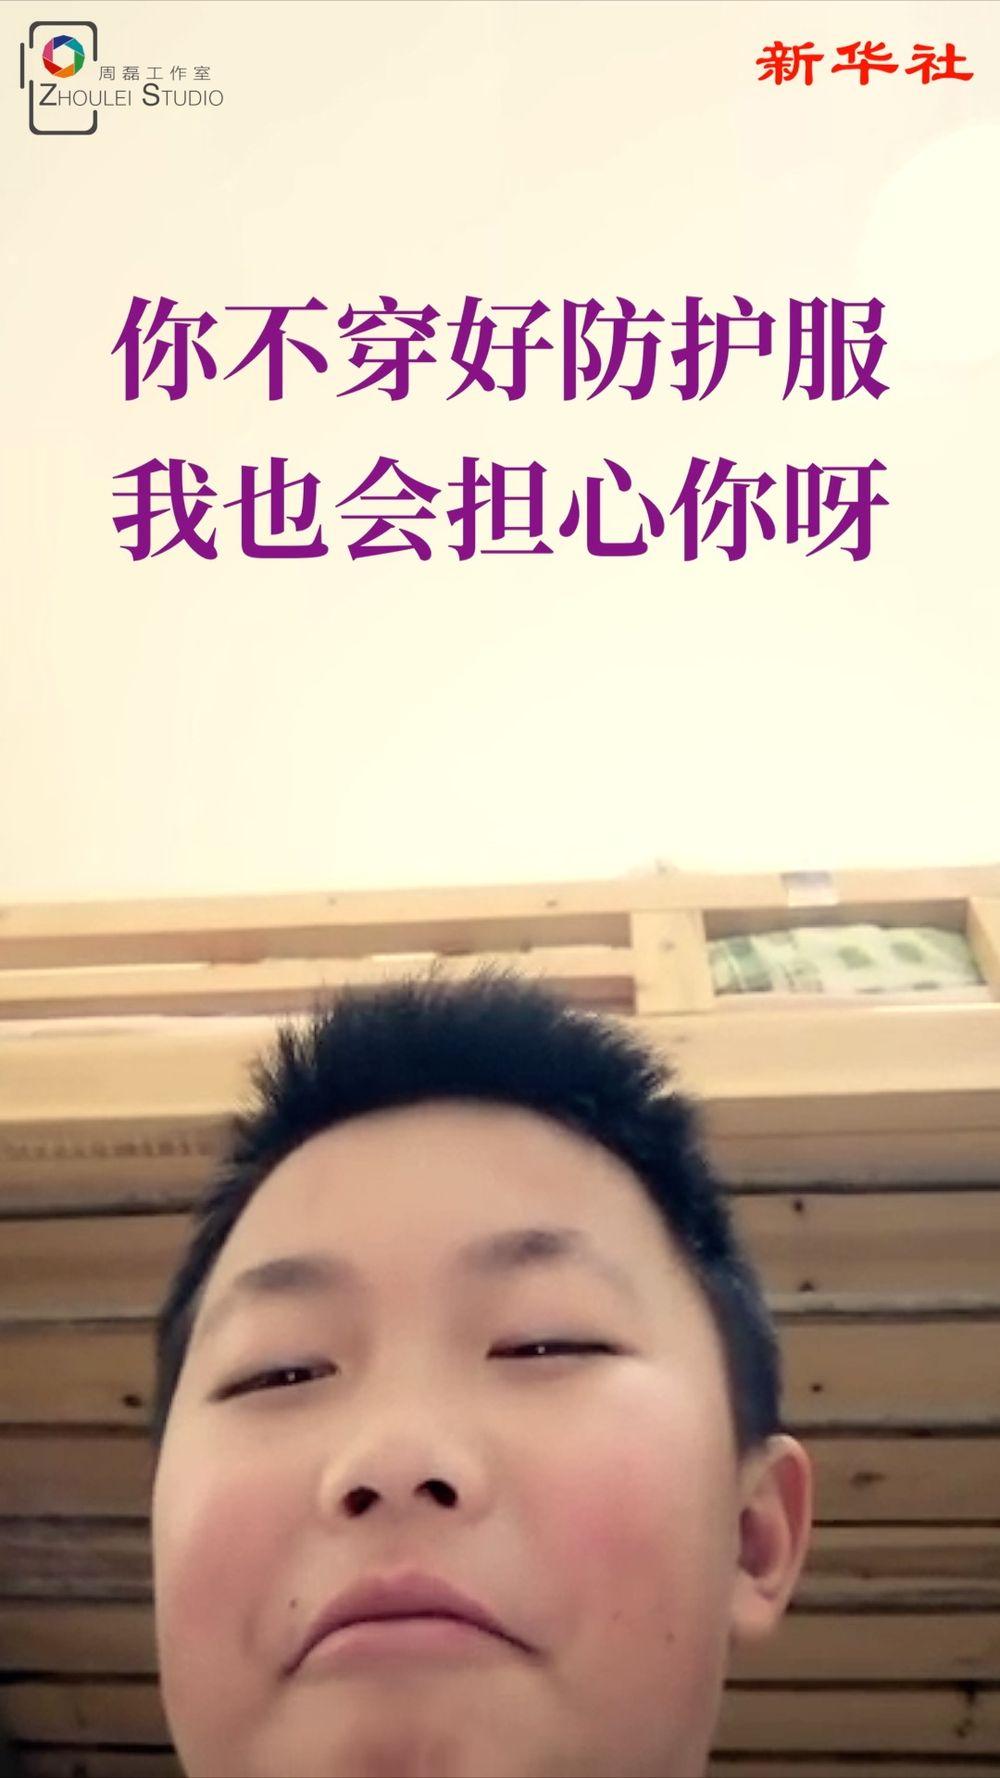 http://www.kmshsm.com/kejizhishi/39939.html